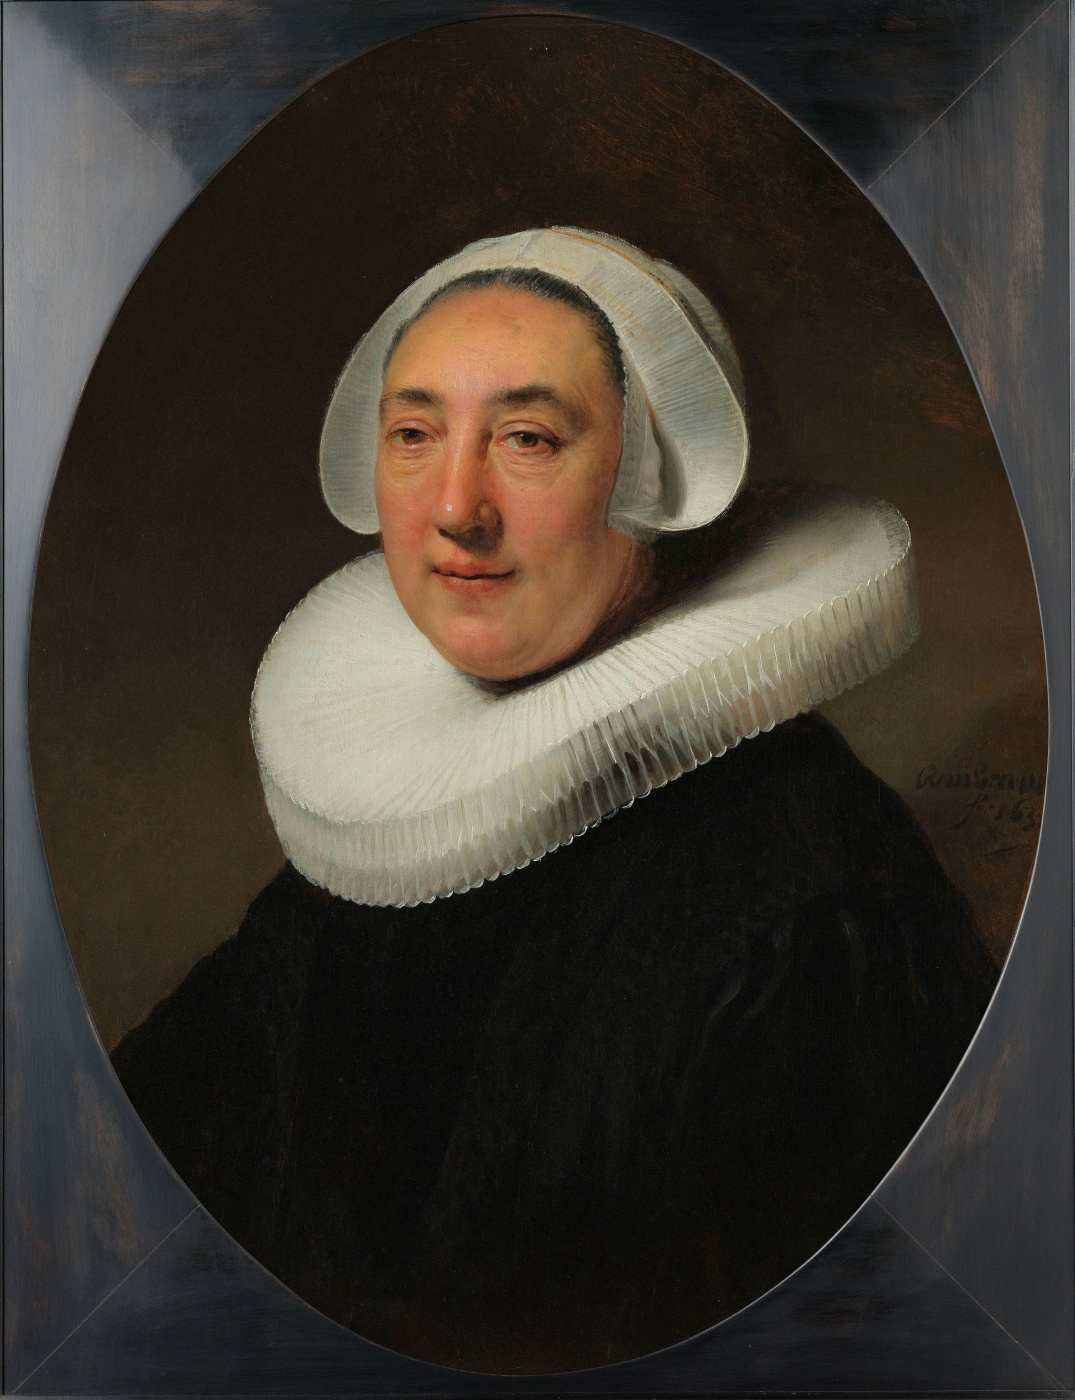 Rembrandt Harmenszoon van Rijn. Portrait Hazy van Clayburg